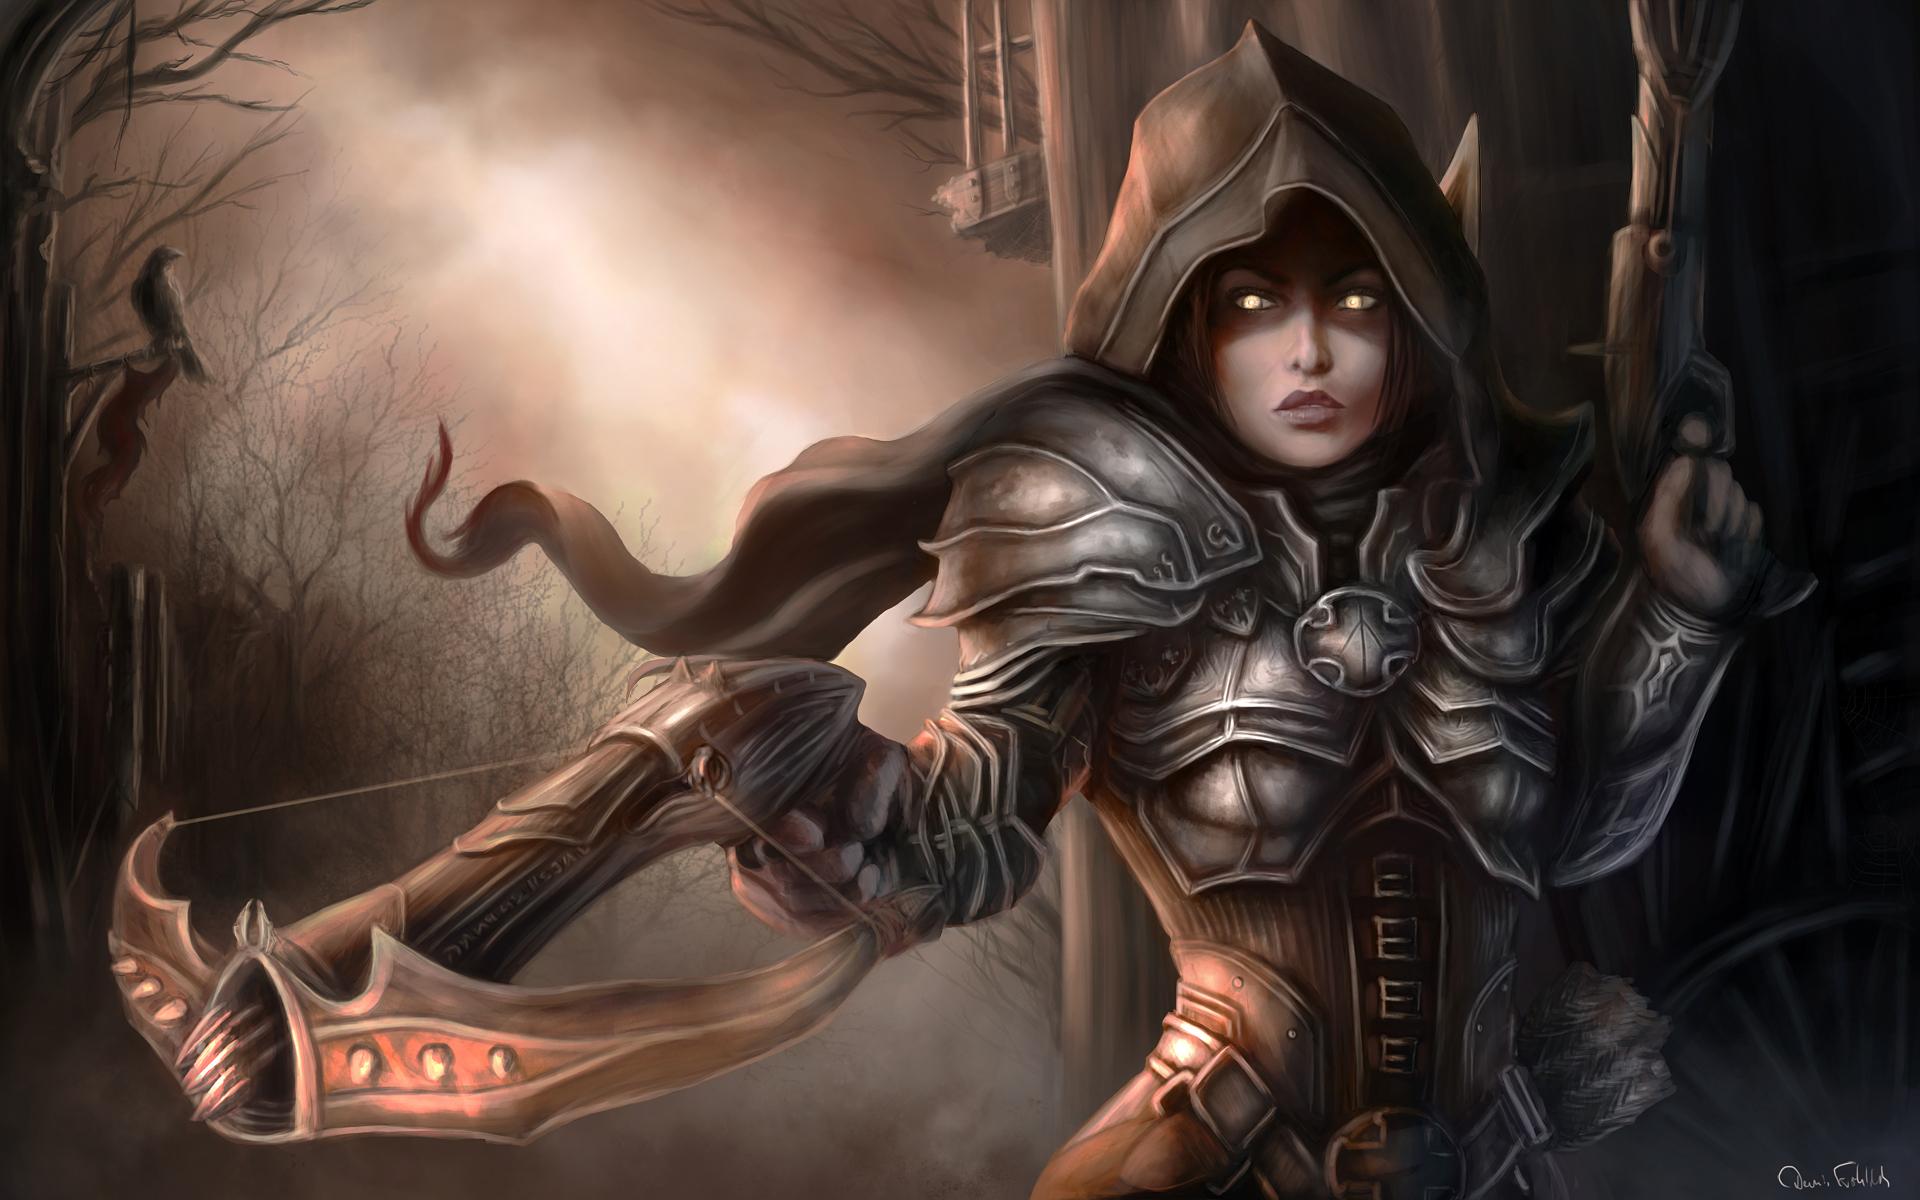 Photo Diablo III Girls Fantasy Games 1920x1200